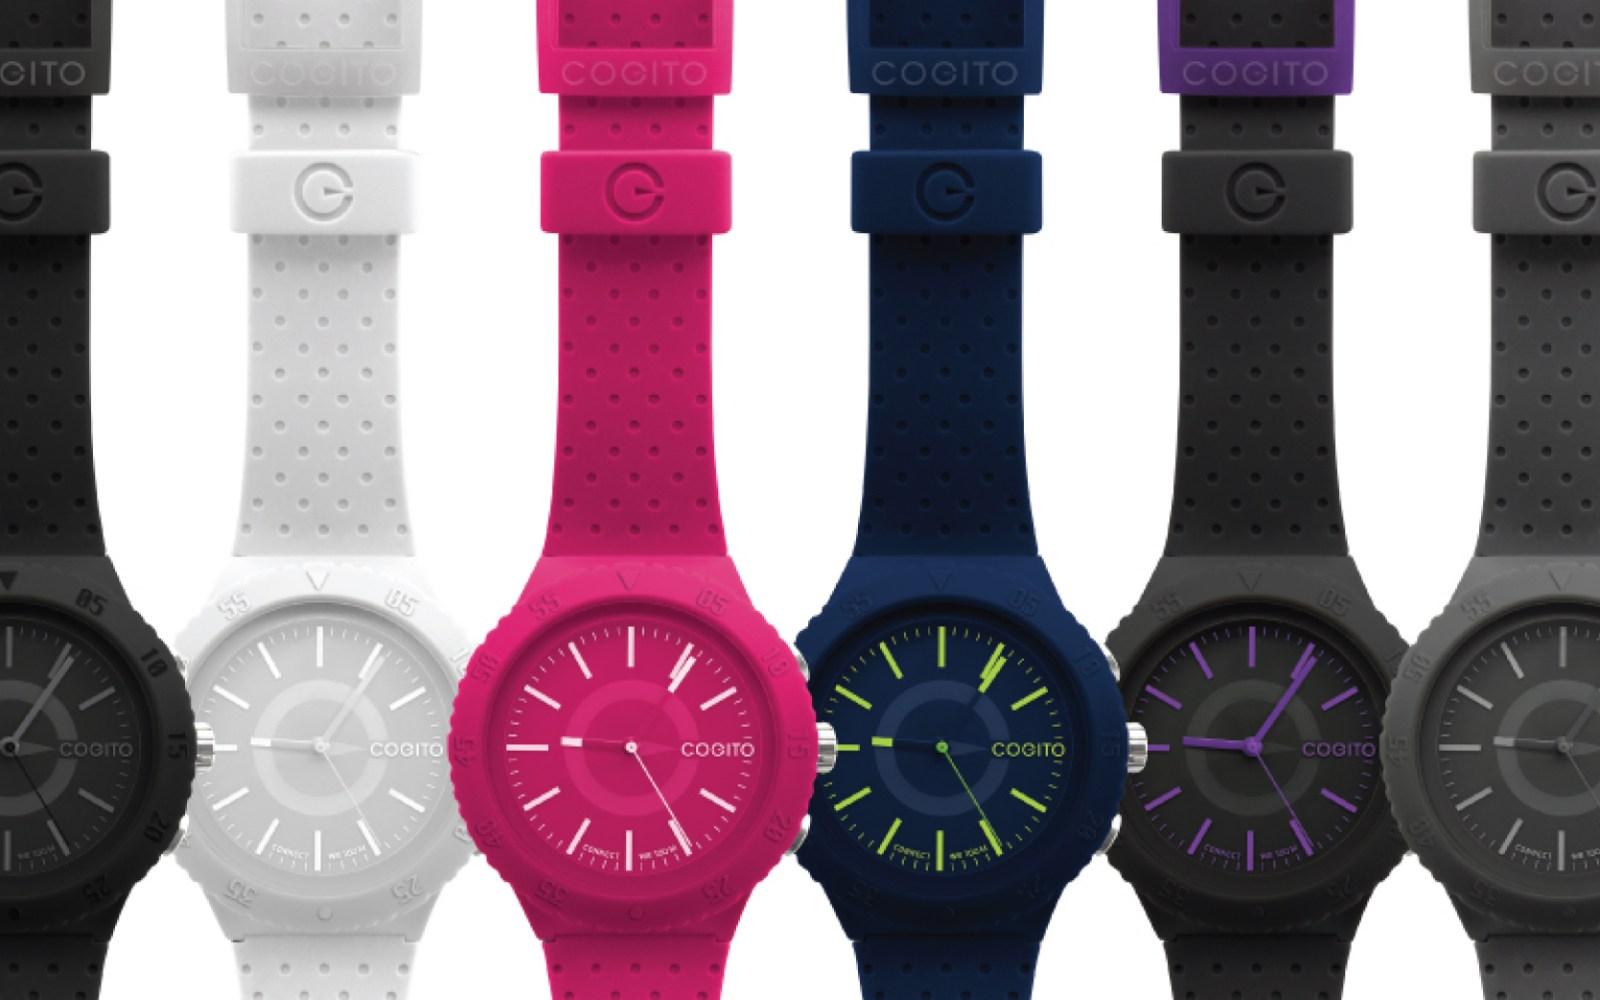 Review: Cogito Pop smartwatch for iOS (video)